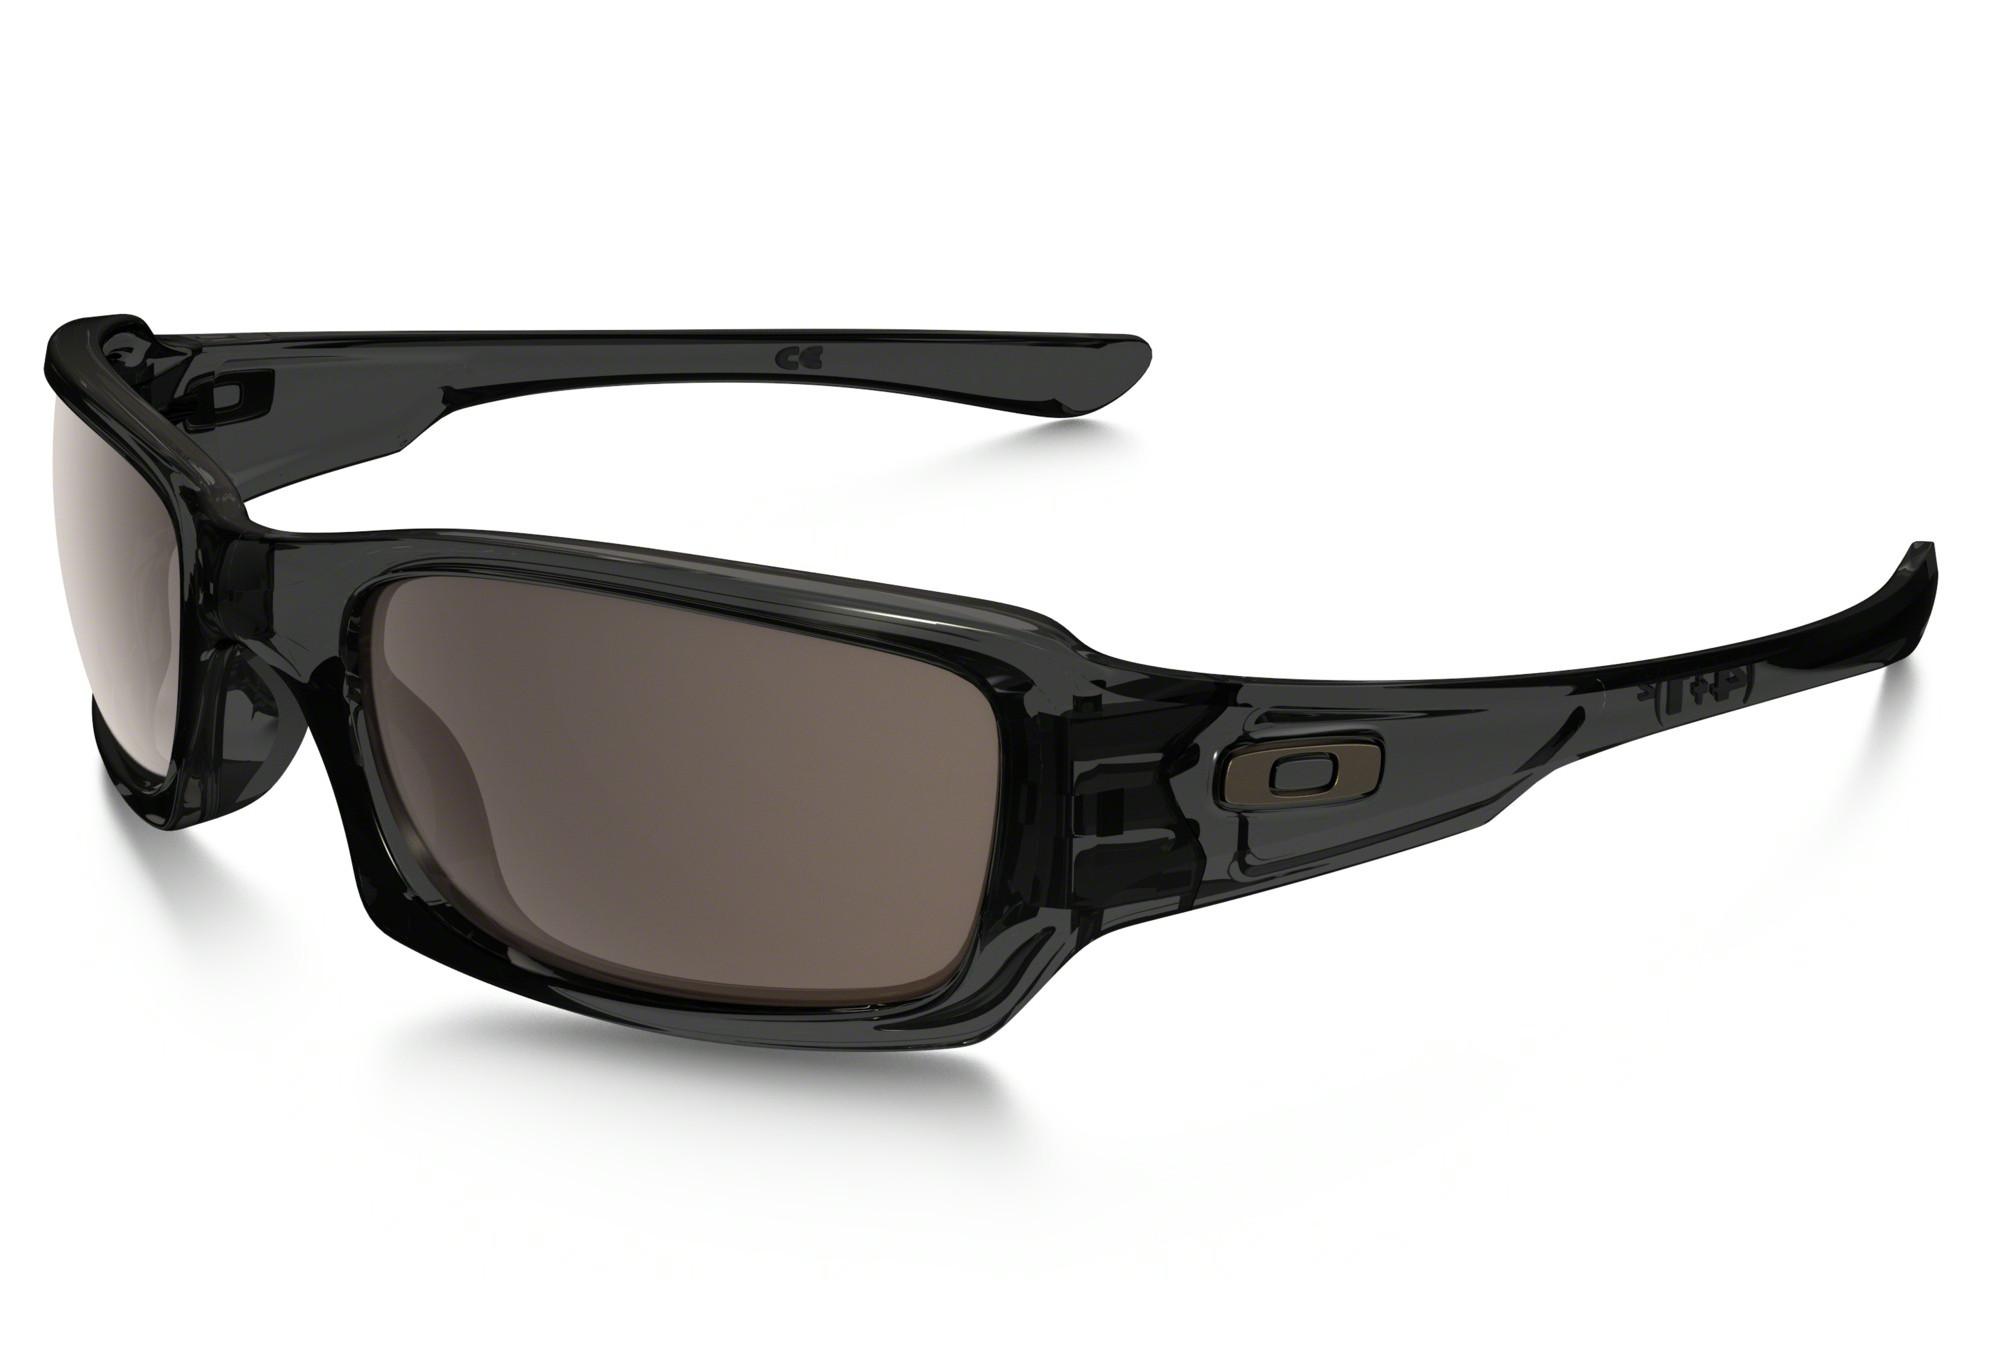 91eab007d16 OAKLEY FIVES SQUARED Sunglasses Black - Grey Ref OO9238-05 ...